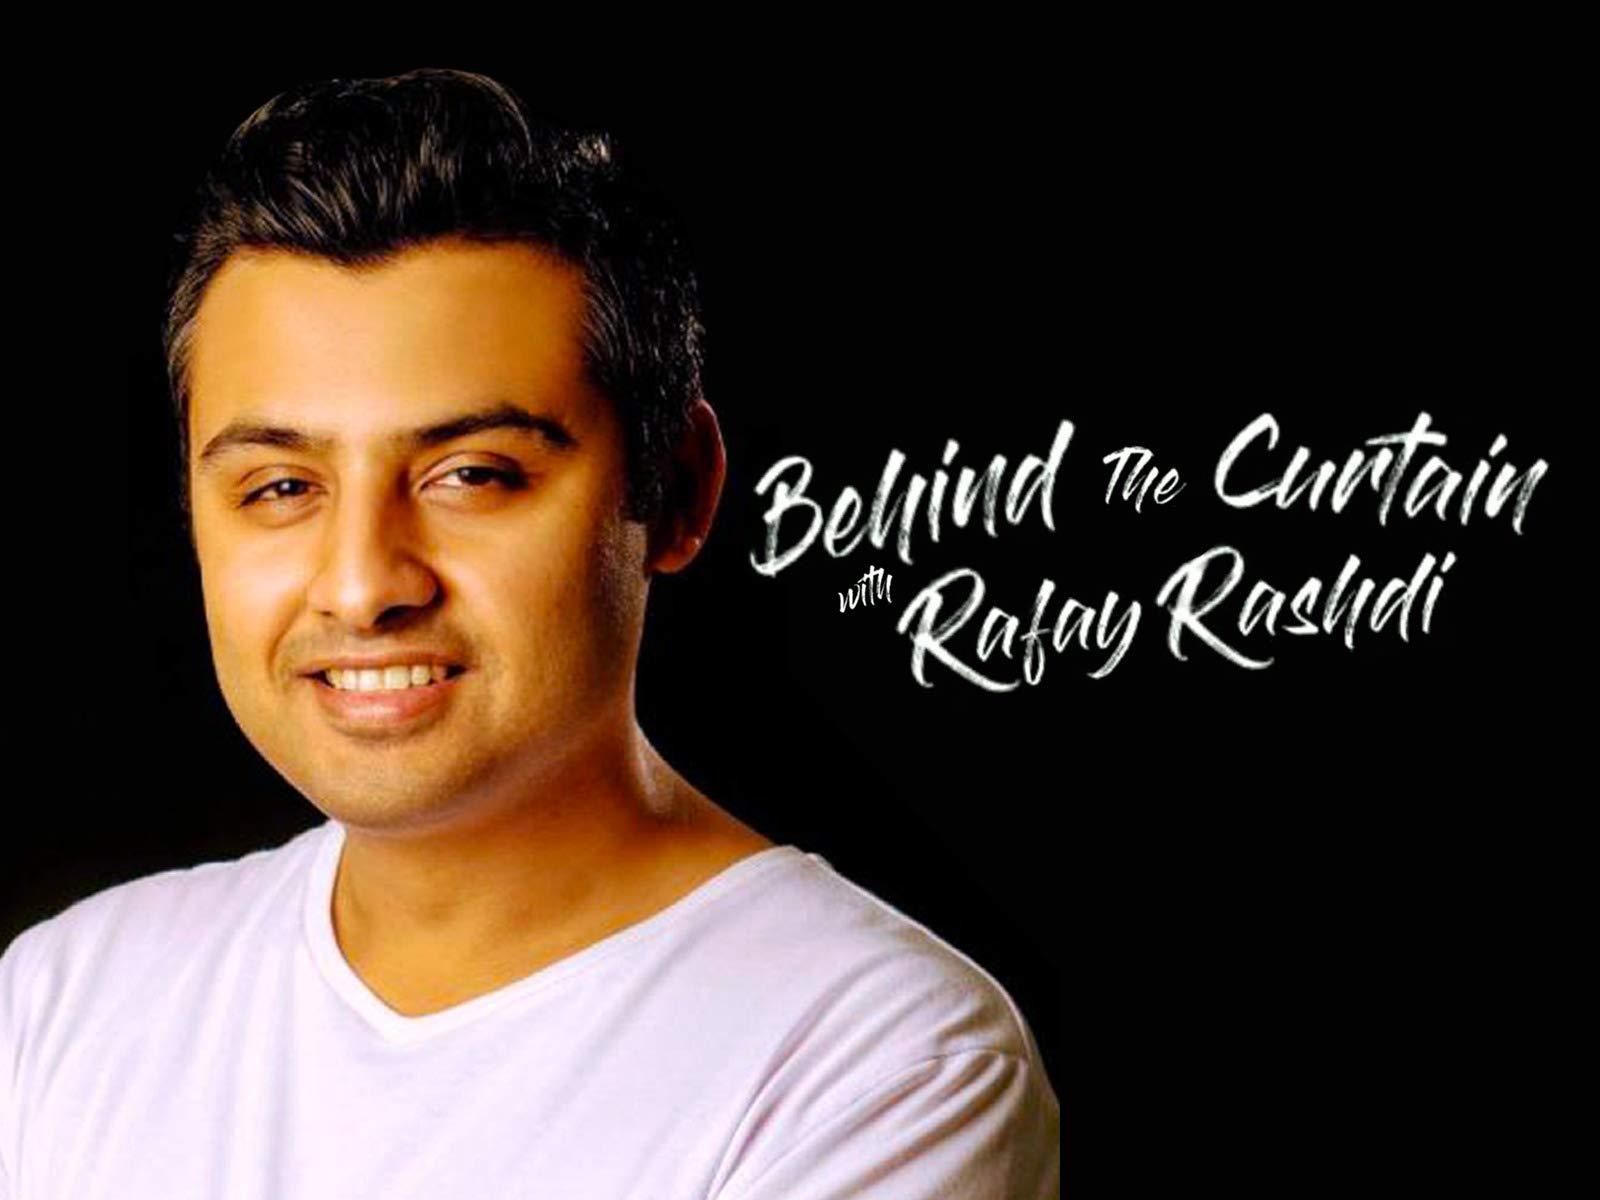 Behind The Curtain With Rafay Rashdi on Amazon Prime Video UK